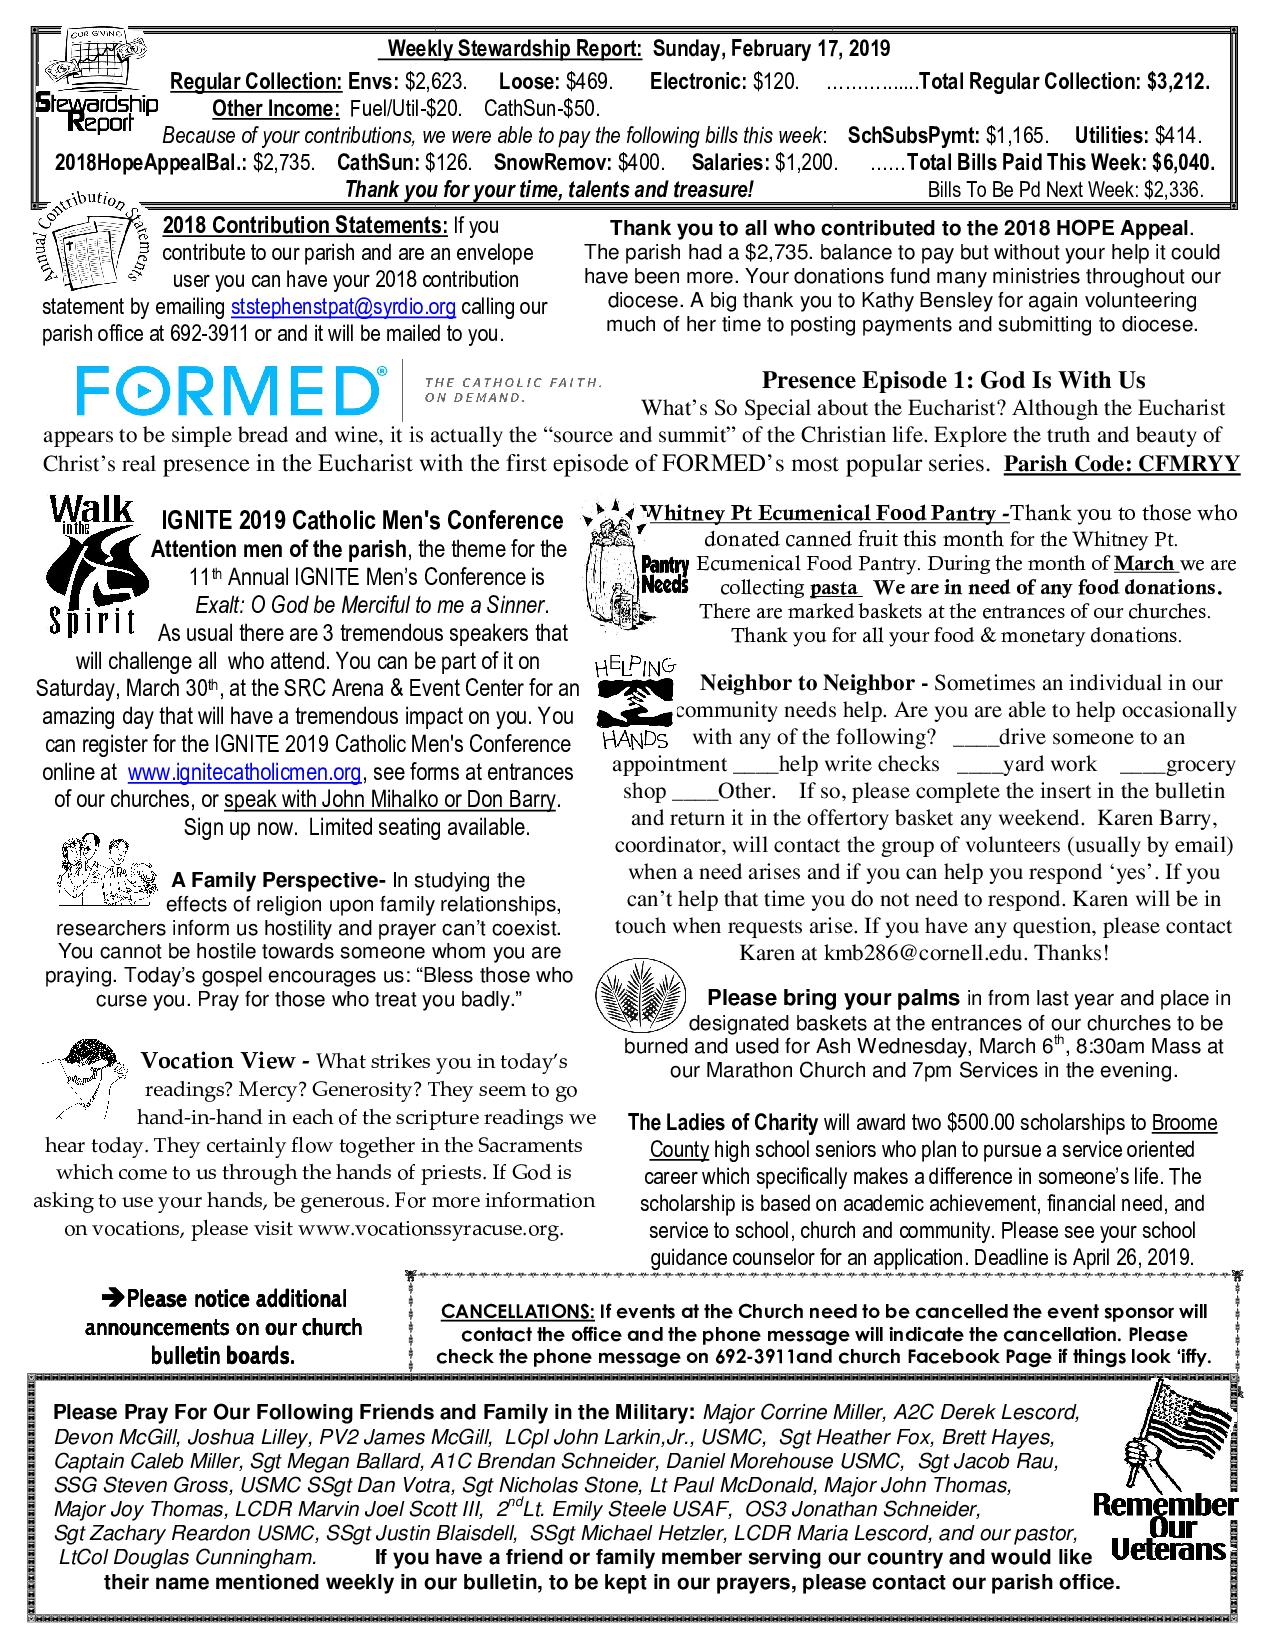 CCSSSP Church Bulletin – February 24, 2019 – Catholic Community of